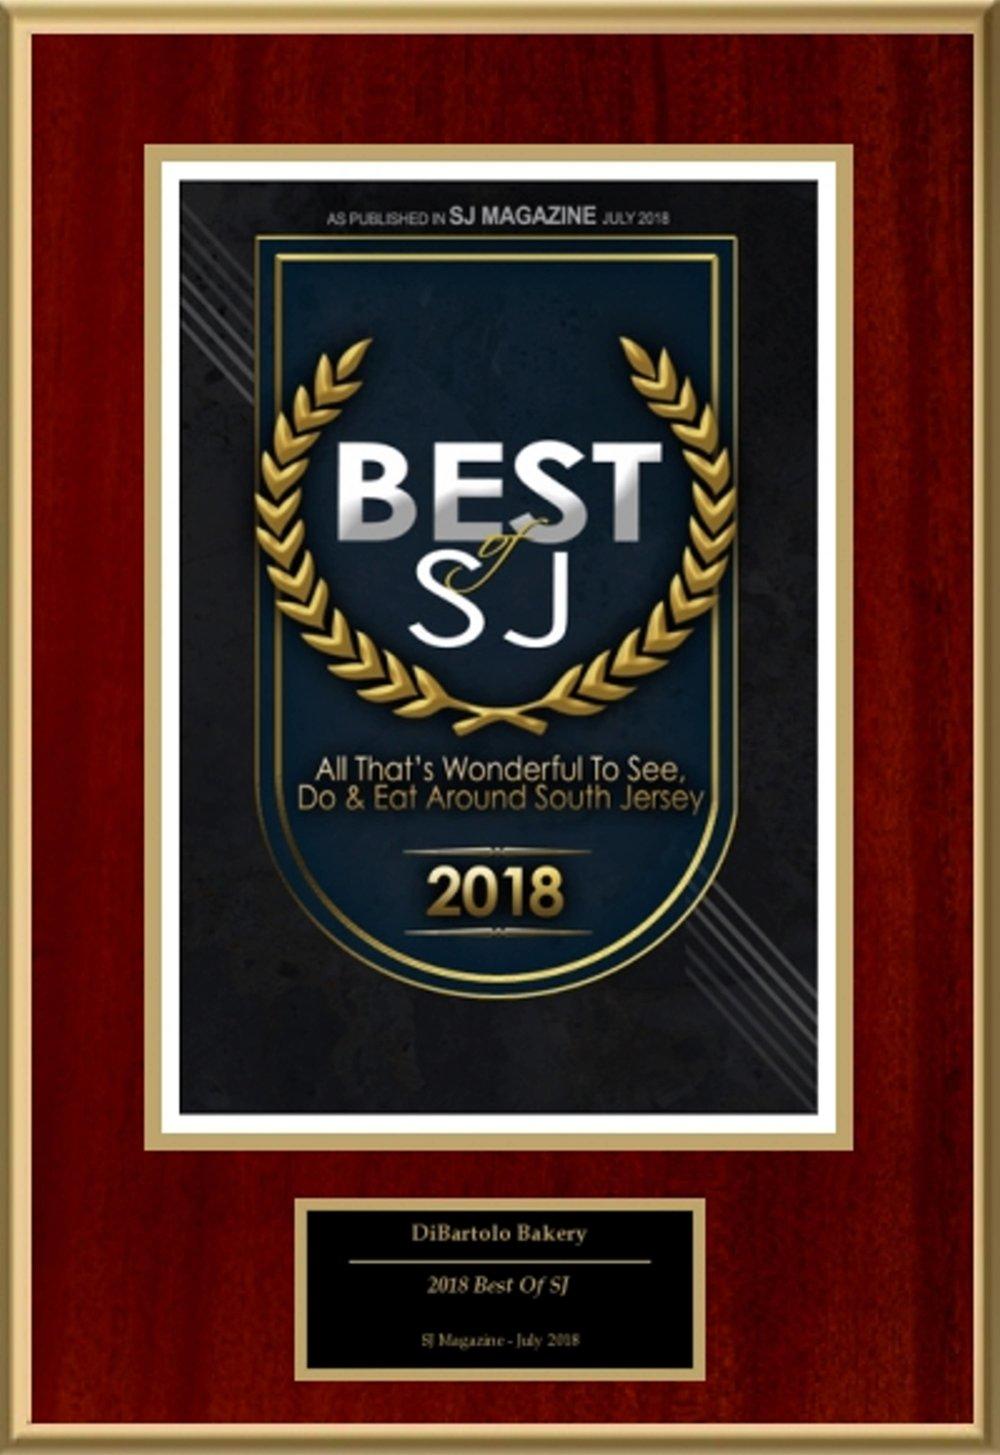 2018 award.jpg